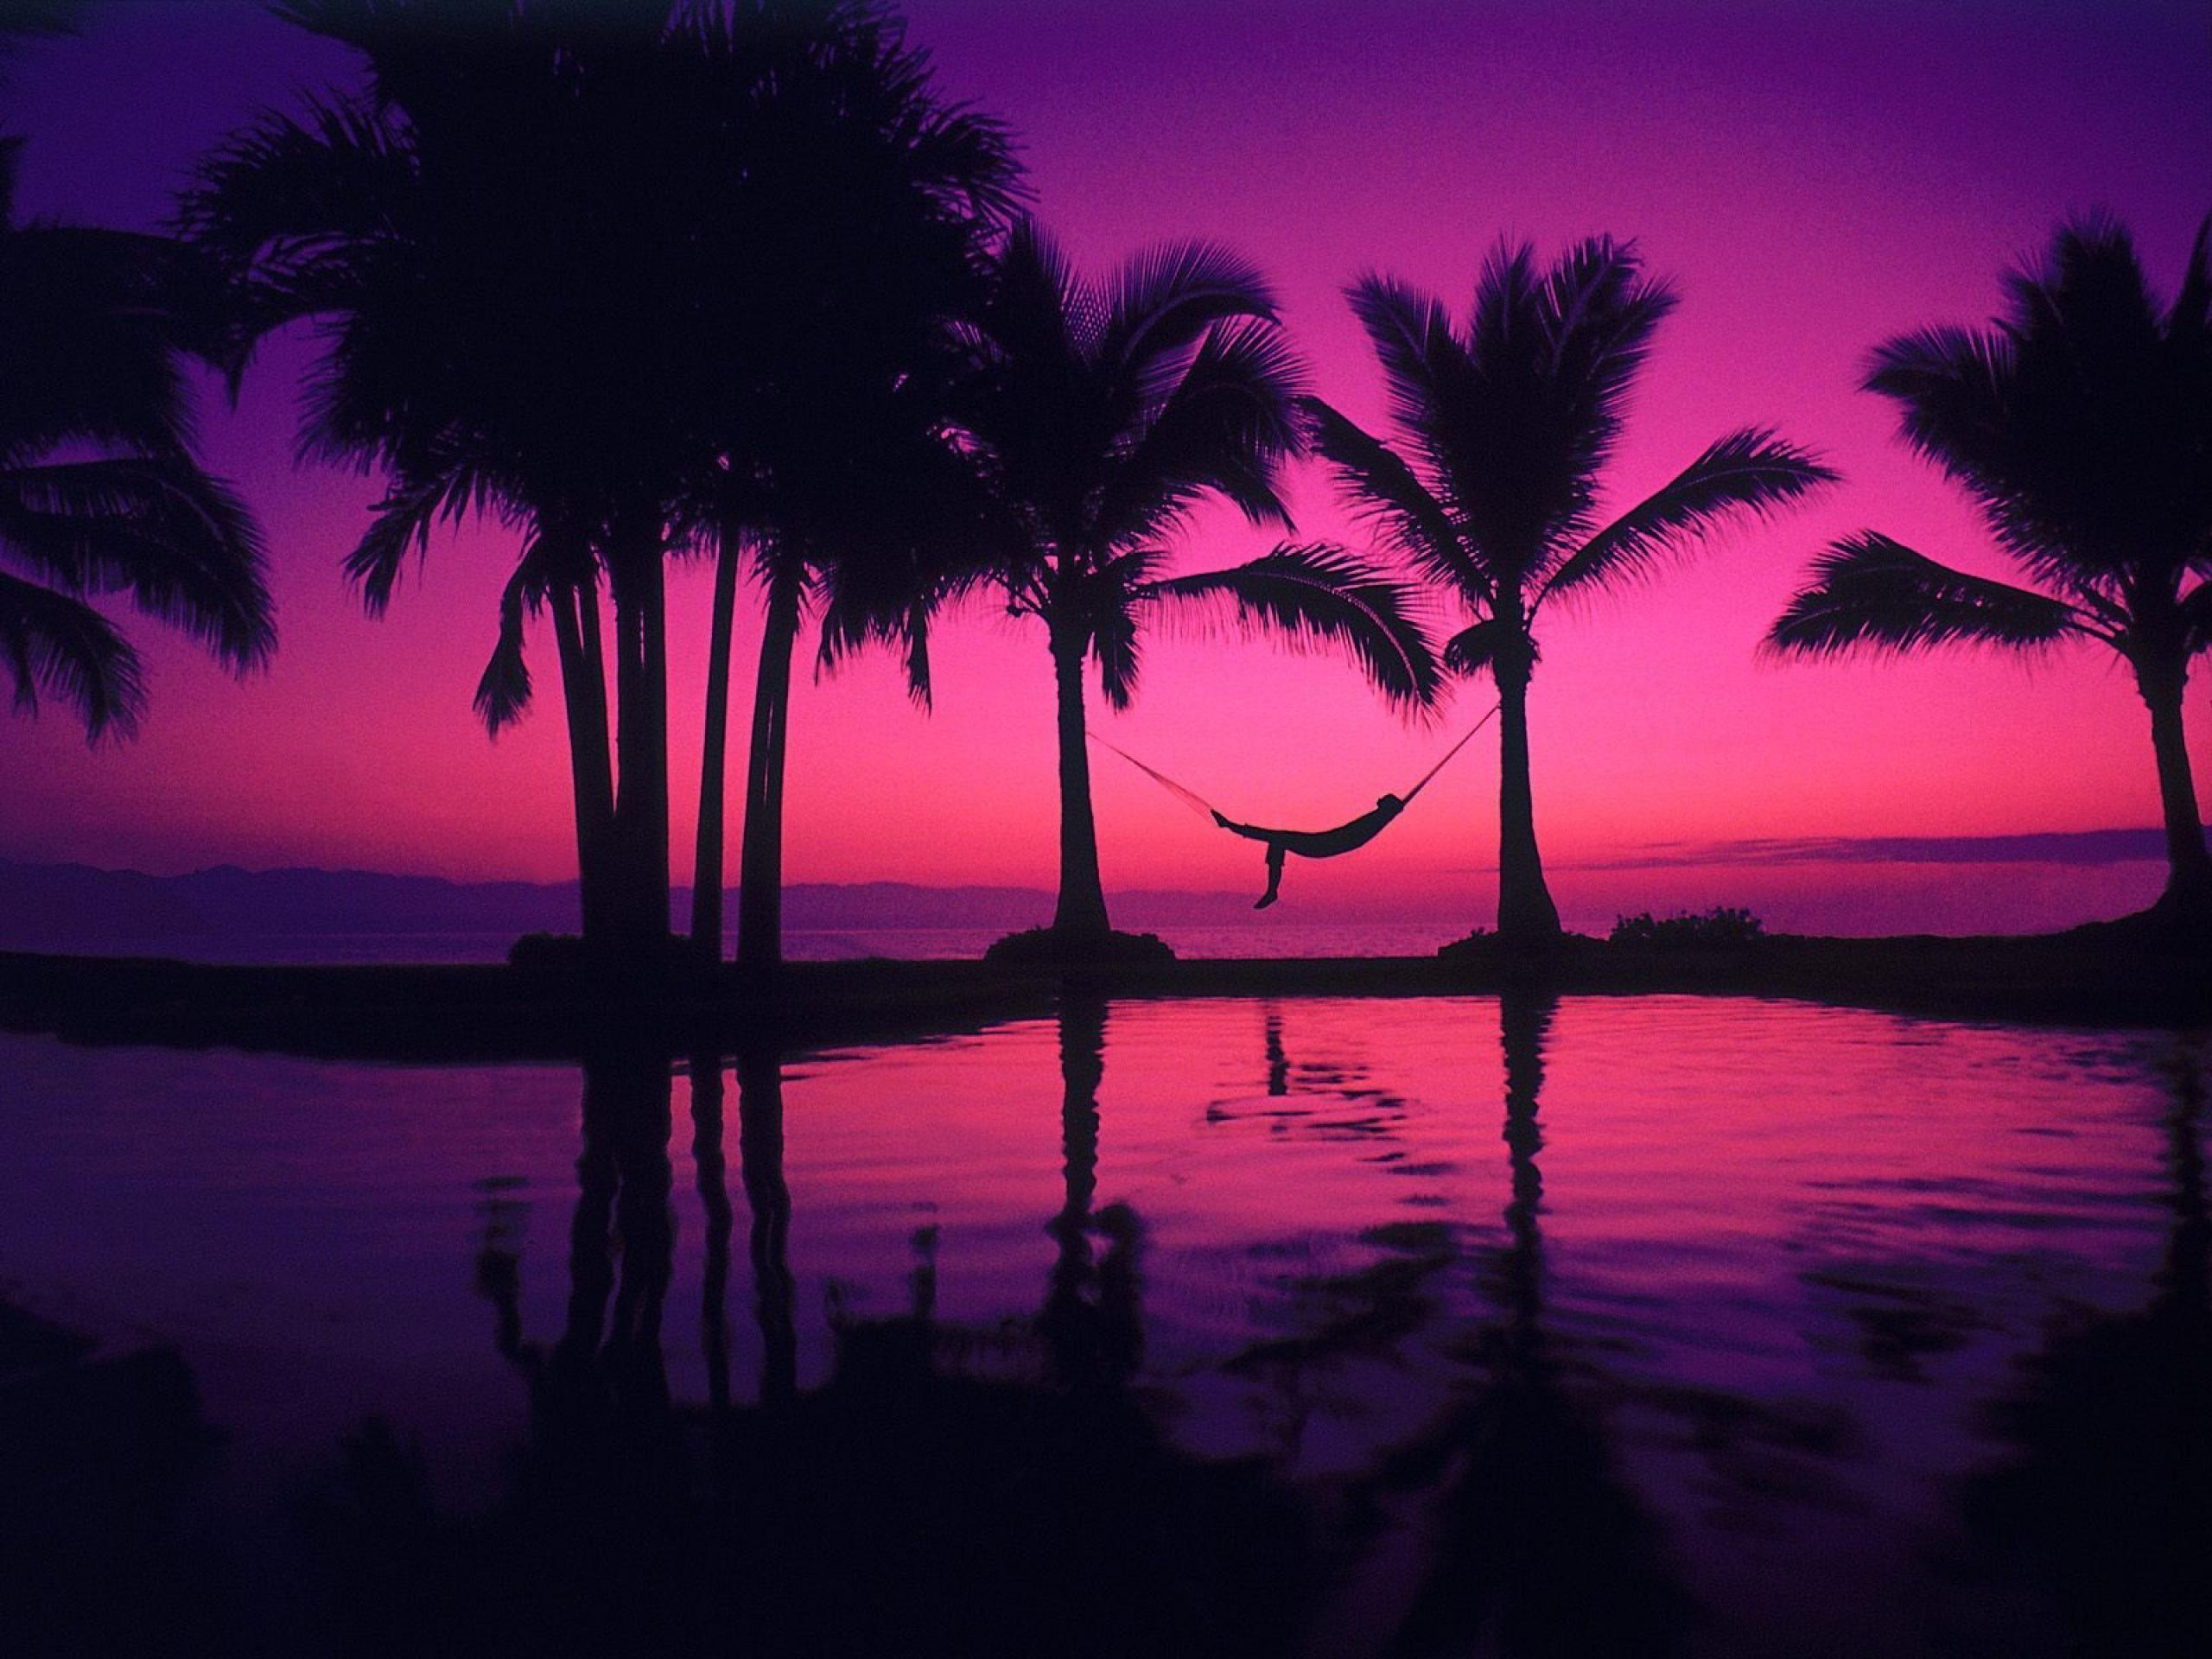 Hawaii Sunset Wallpapers - Wallpaper Cave